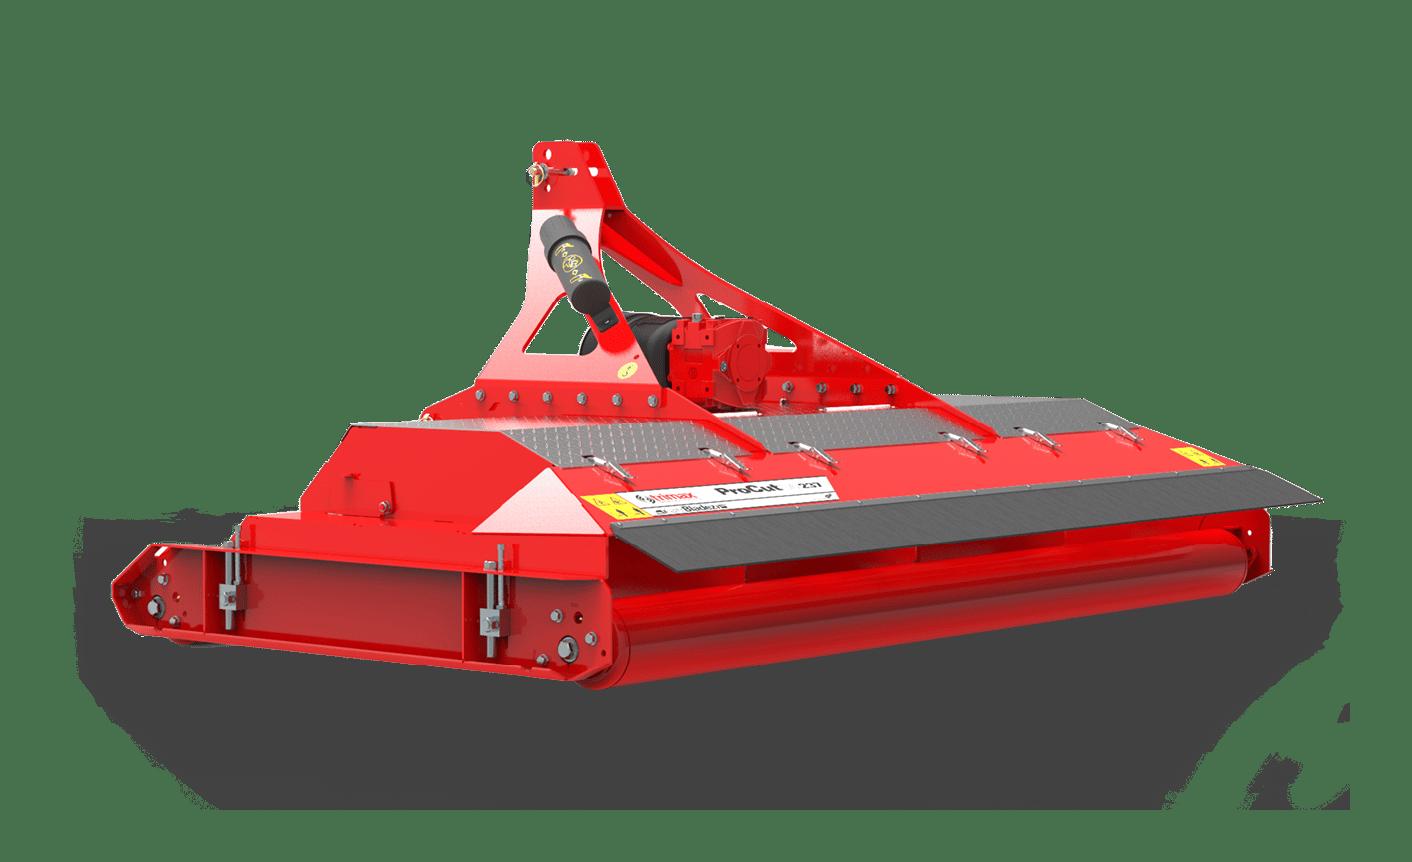 ProCut S4-237 Mower Red